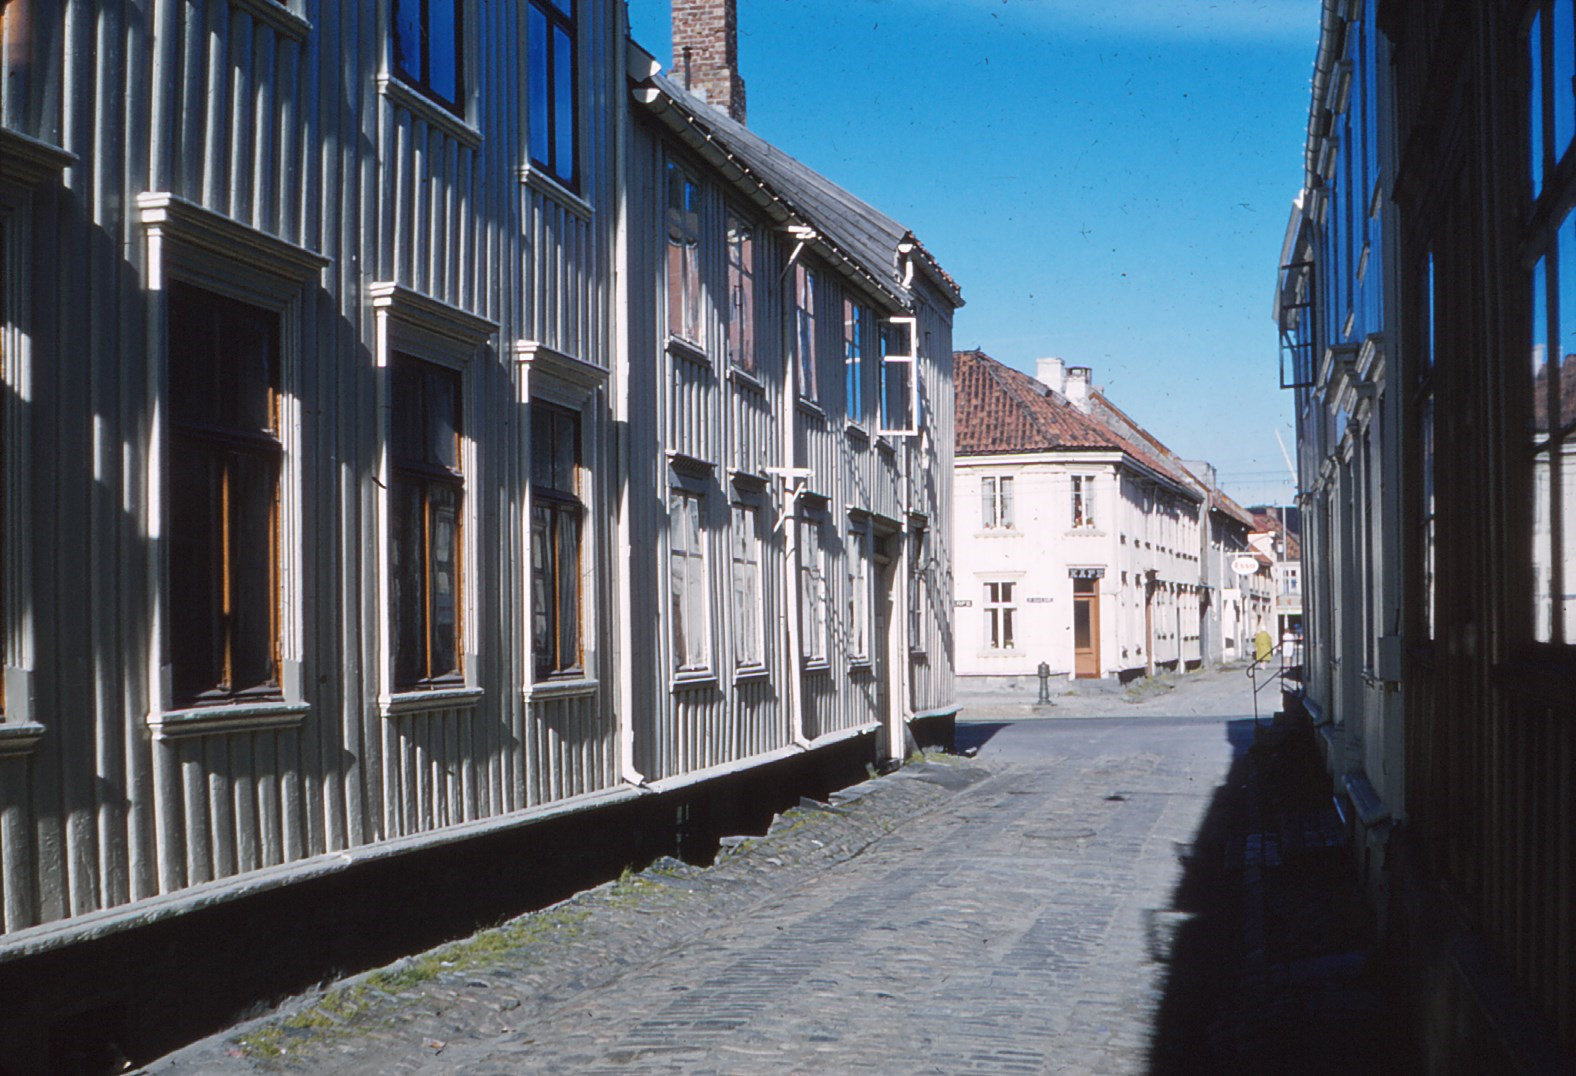 1152 (2) Straat in Trondheim